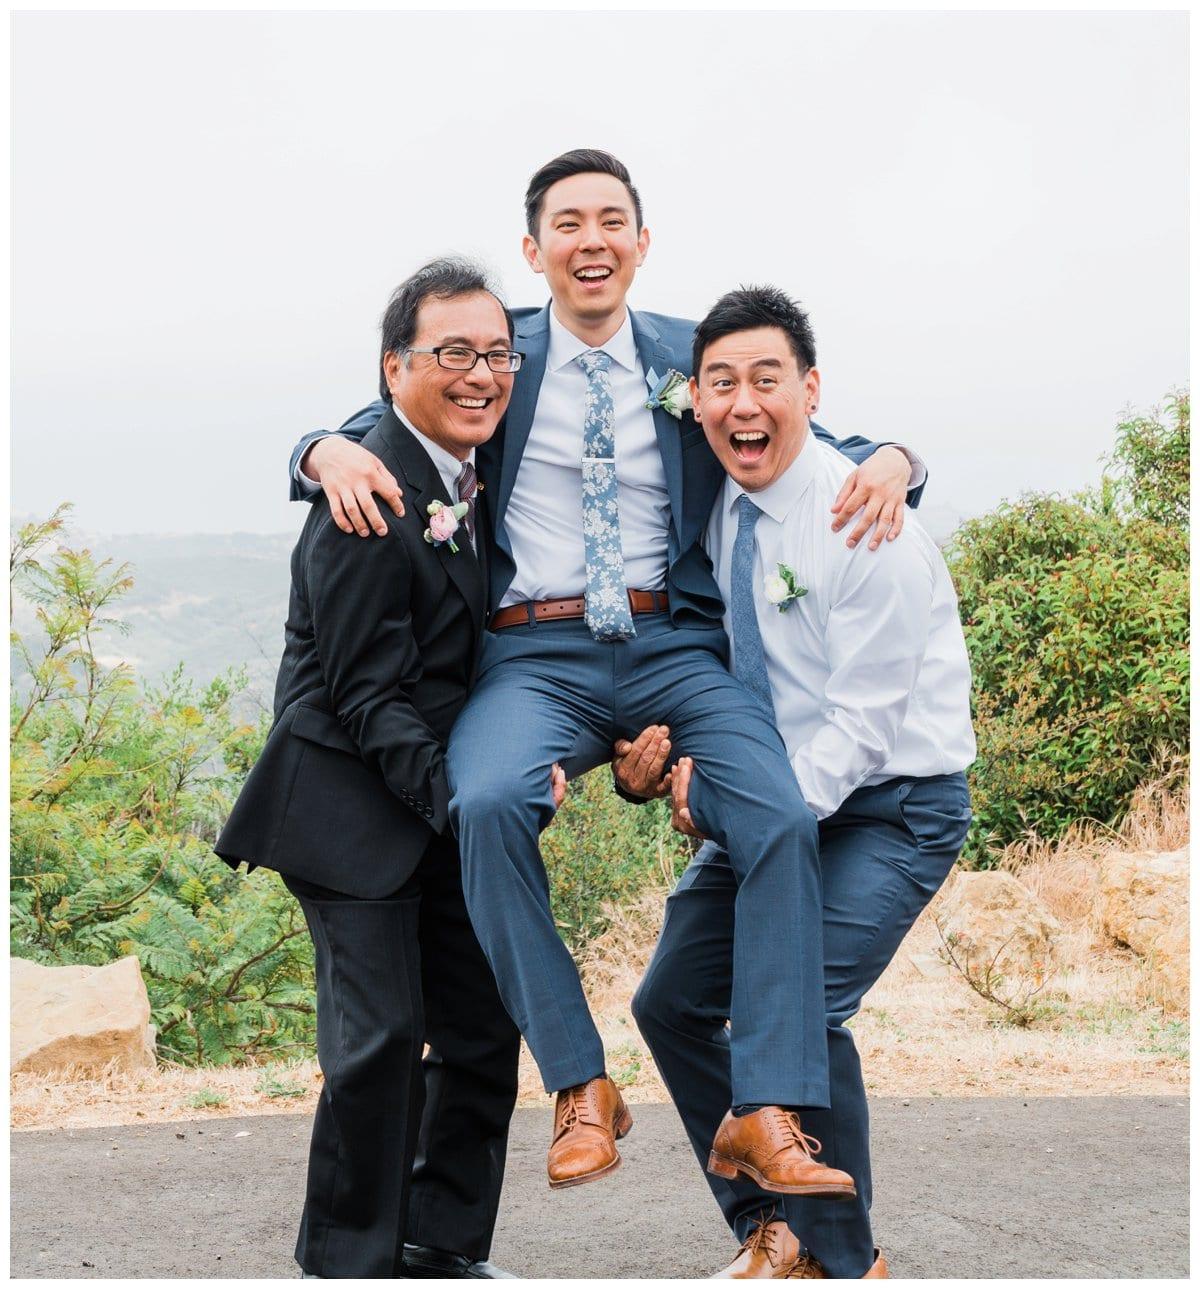 Malibu-Solstice-Vinyard-Wedding-Carissa-Woo-Photography_0038.jpg